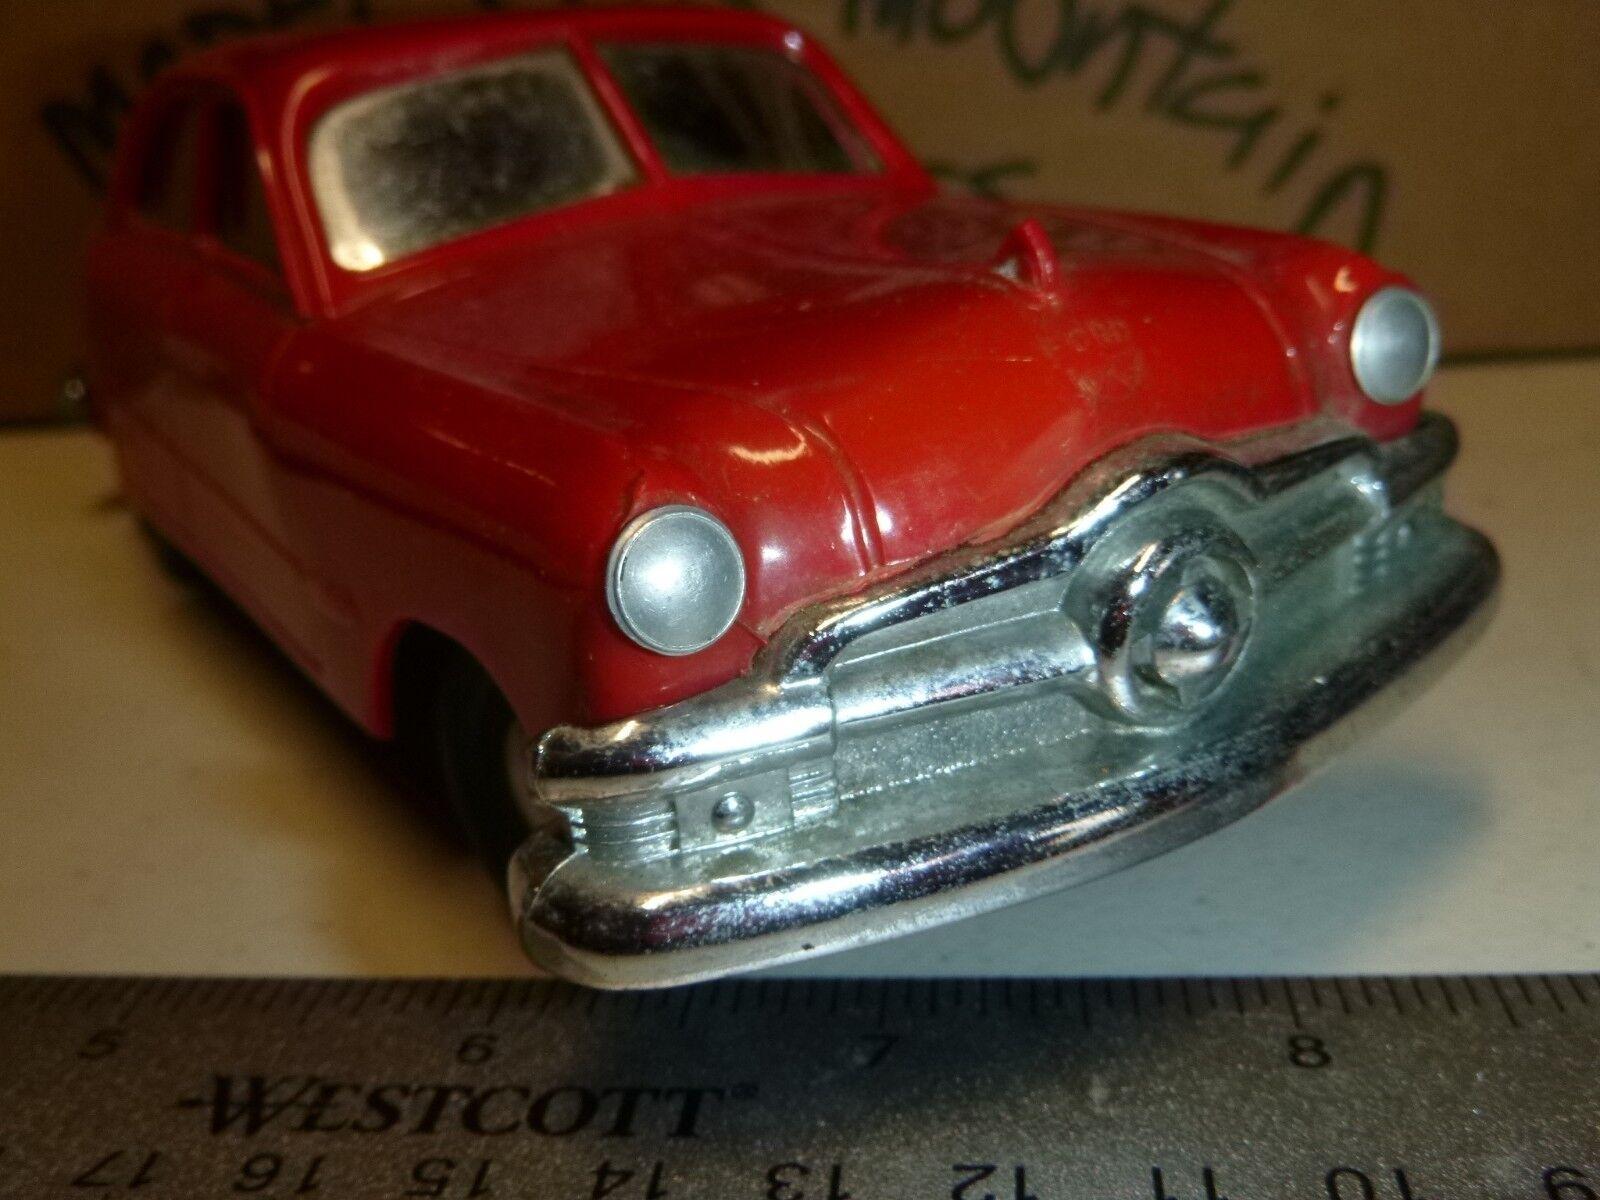 B4 Amt 1950 Ford Rosso Rosso Rosso Promo Sterzabile Vintage 1 24 Vettura Mountain 781f34